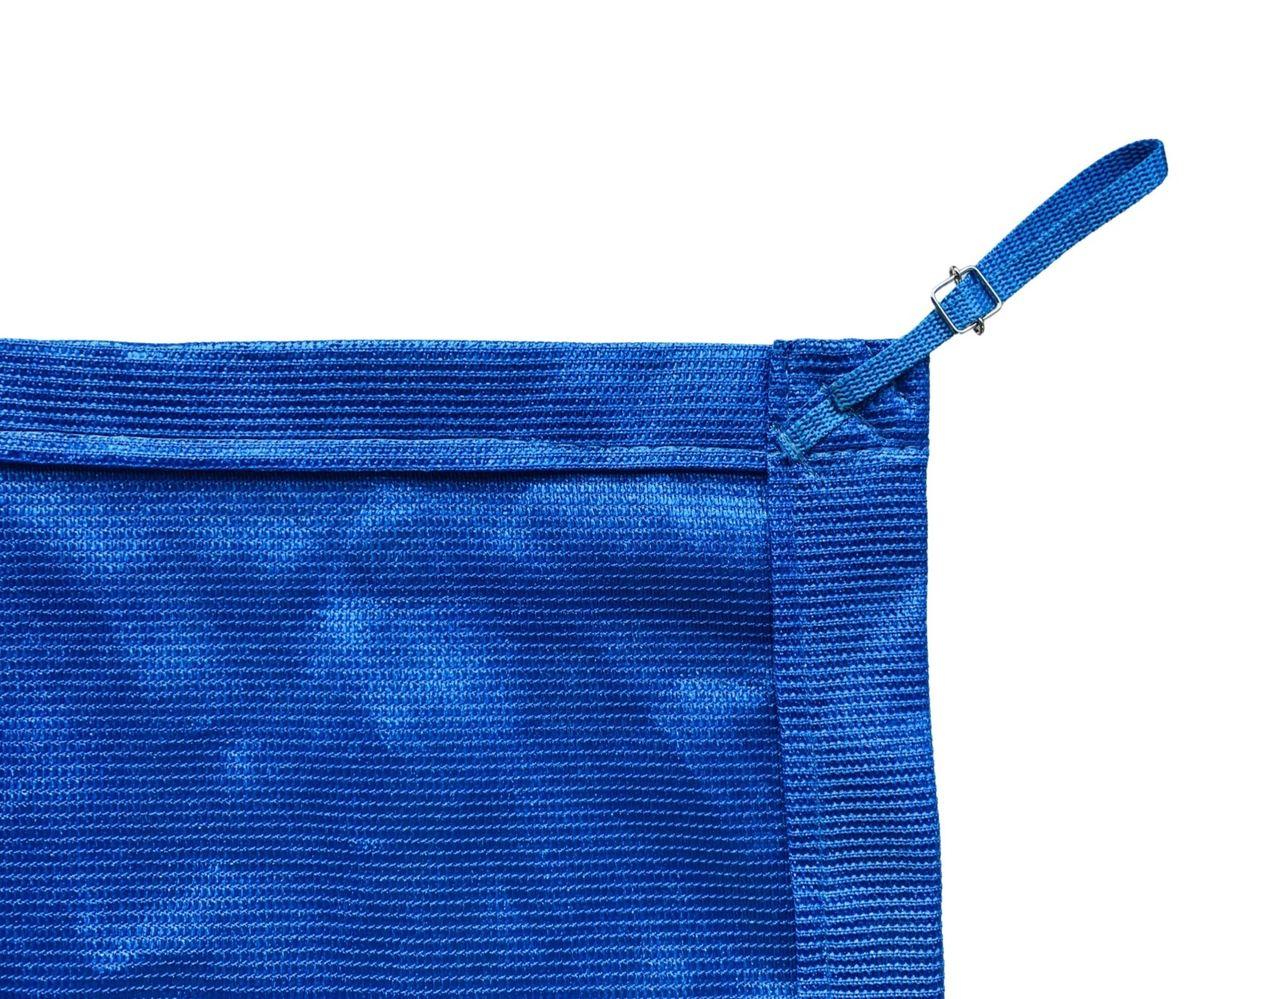 Tela de Sombreamento 90% Azul com Esticadores - Largura: 2,8 Metros